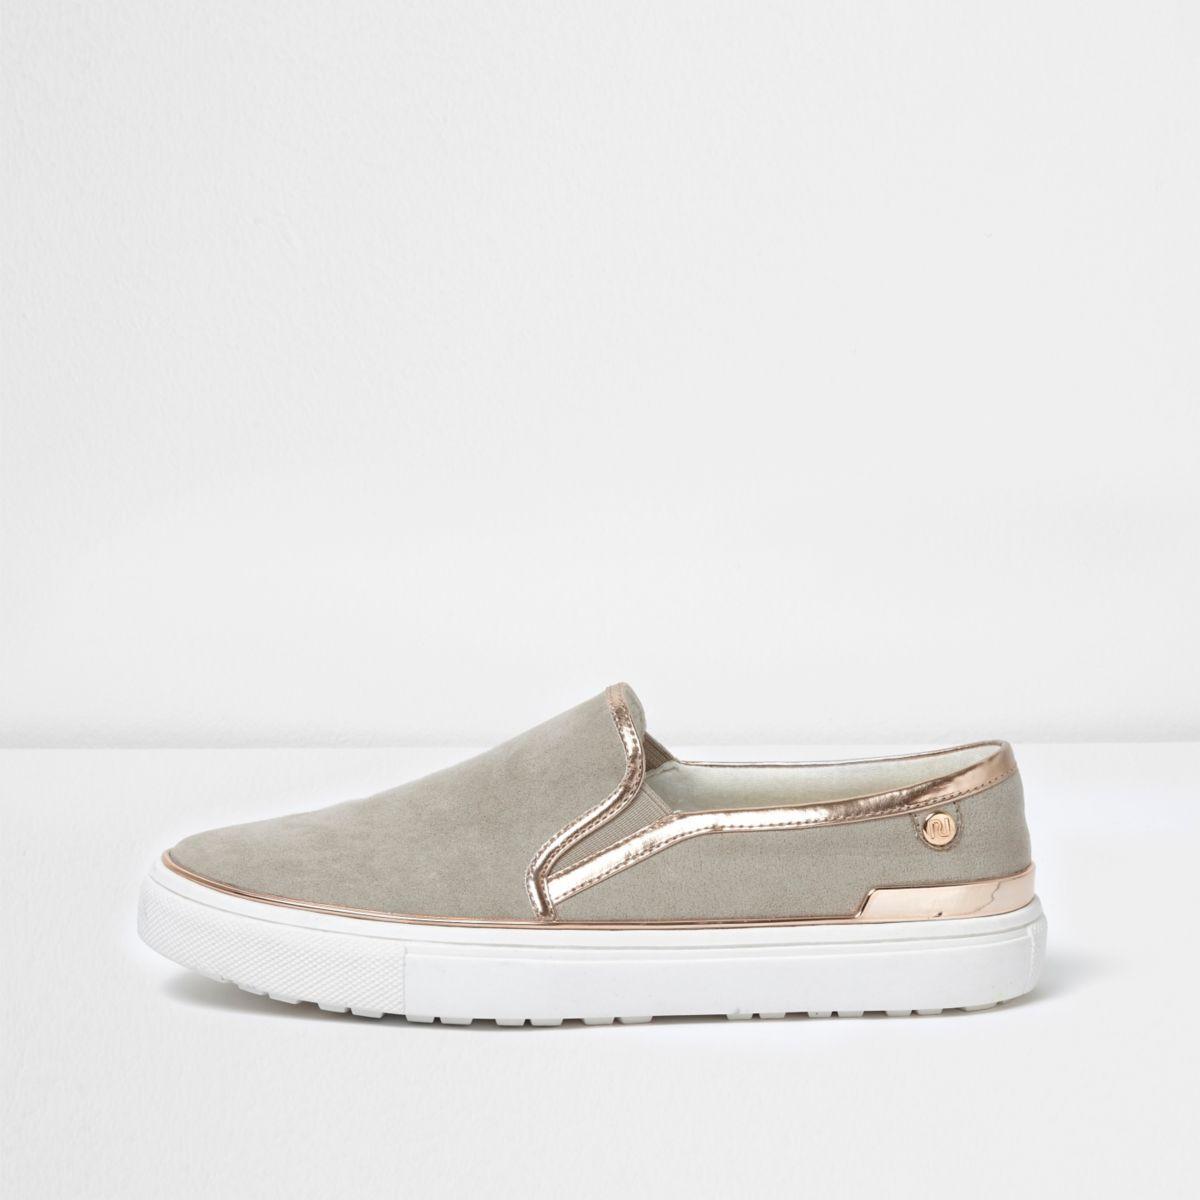 Boot shoes women, Shoes, Shoe boots